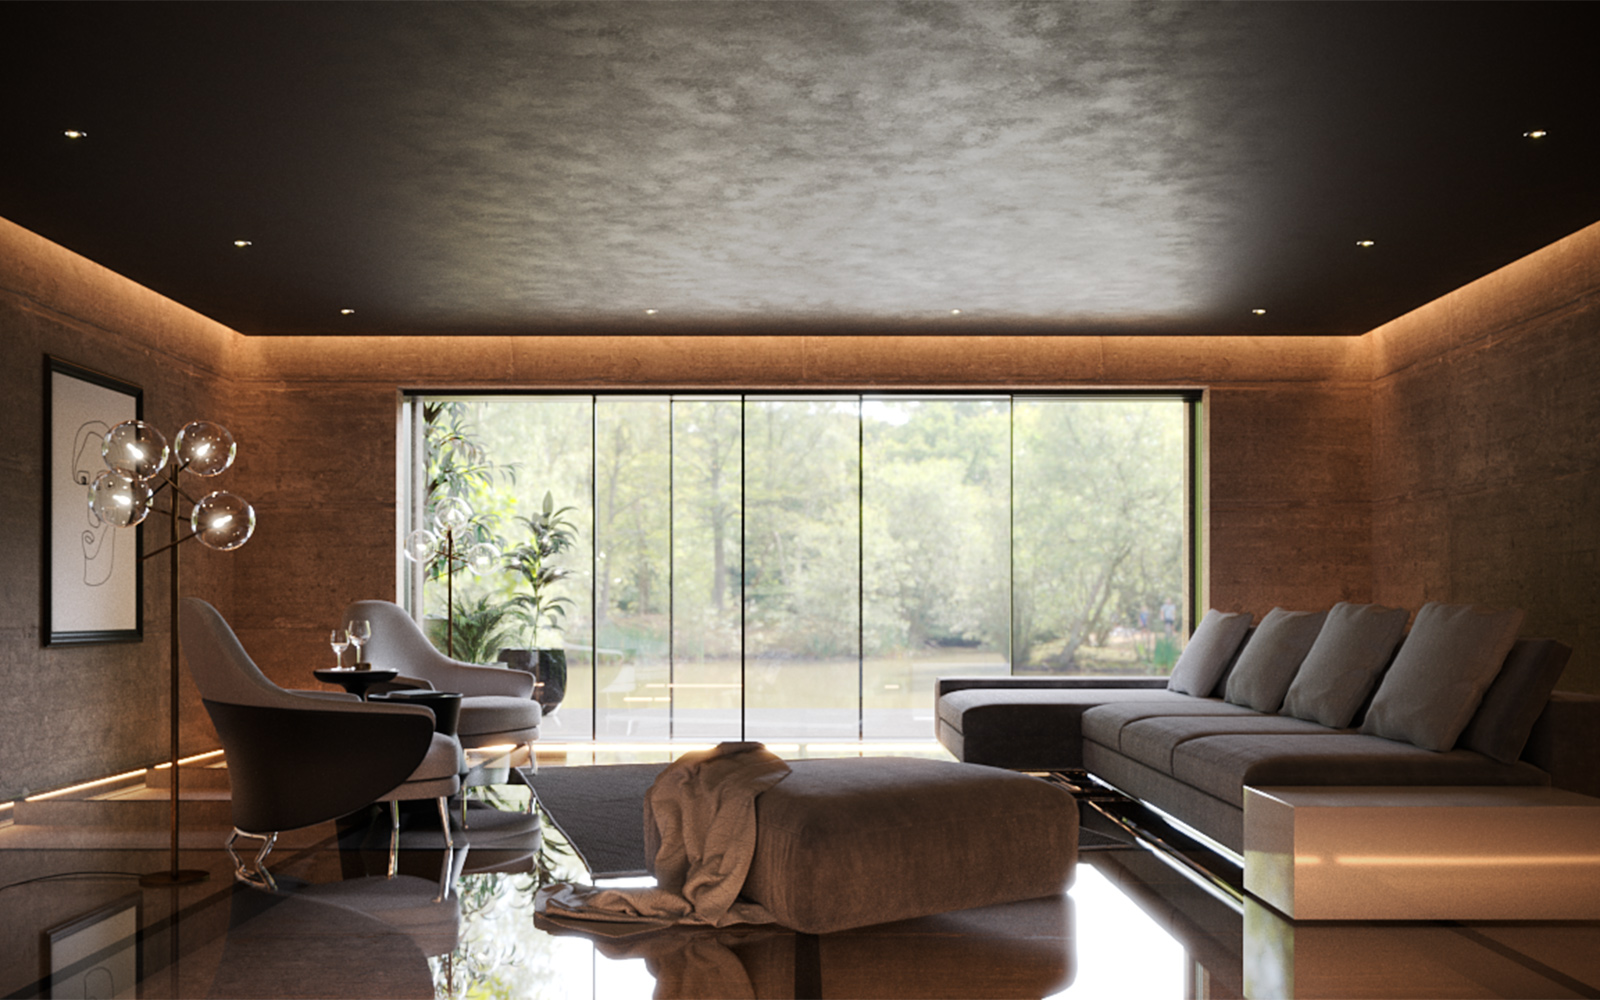 6 Luxurious Contemporary Interior Design Ideas for Your Estate